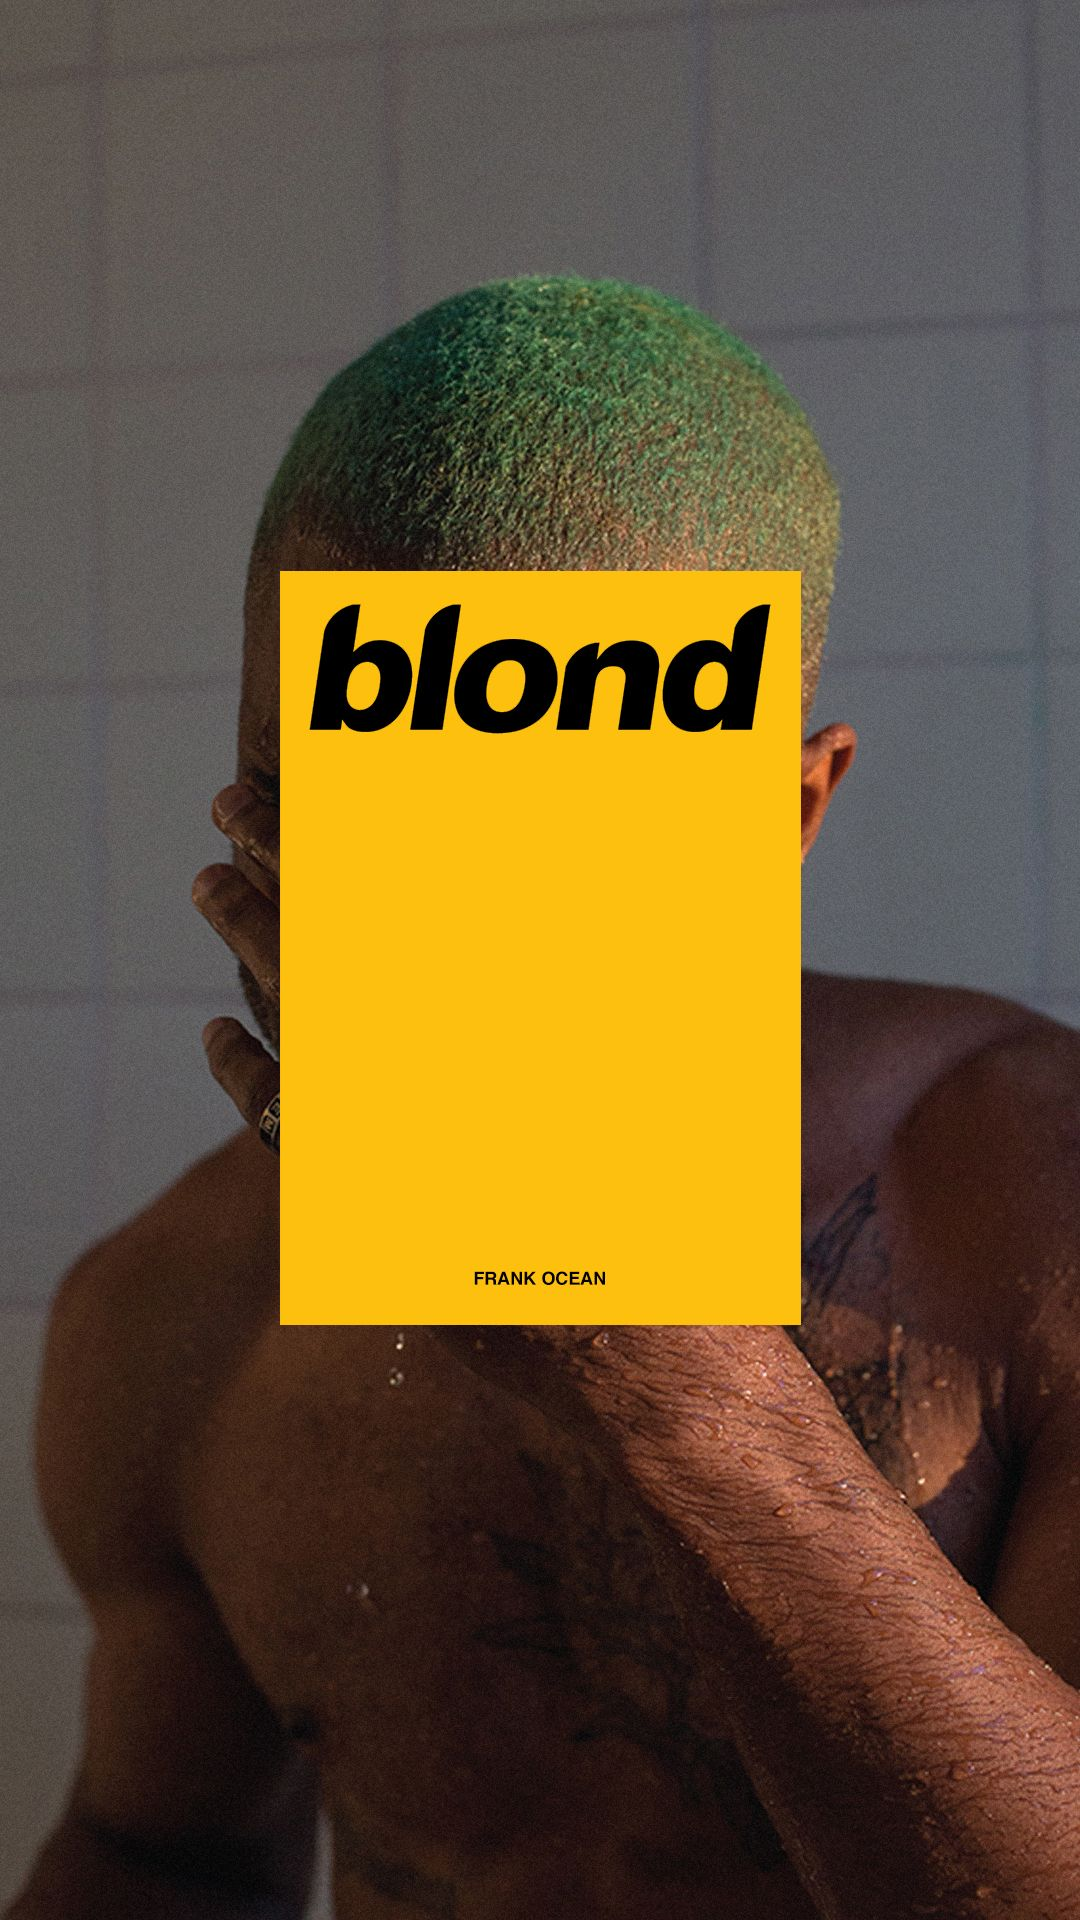 blond Frank ocean wallpaper, Frank ocean, Rap wallpaper